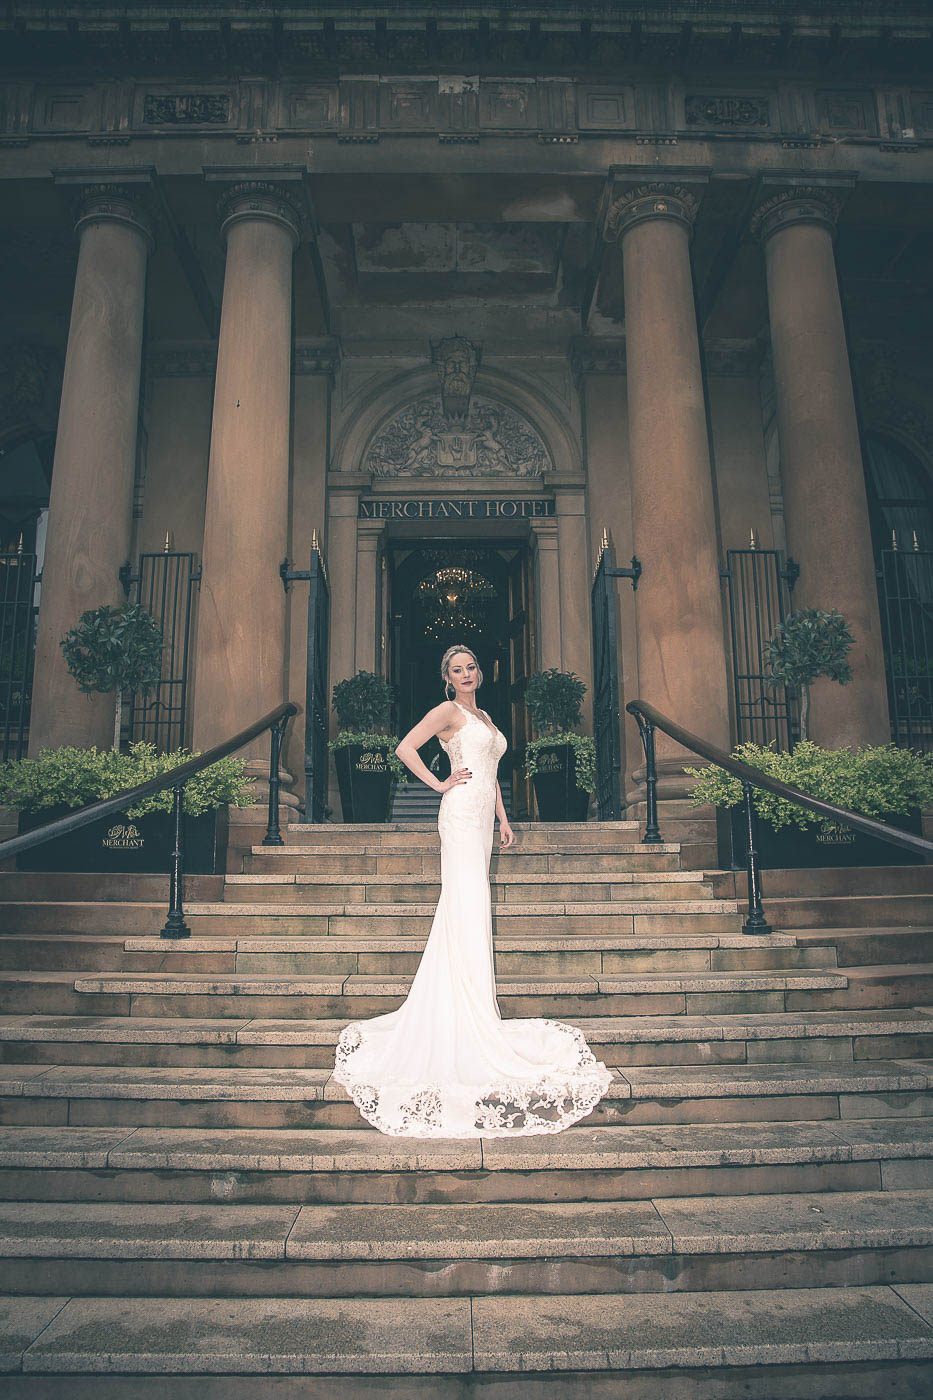 Merchant Hotel Wedding, Bride and dress